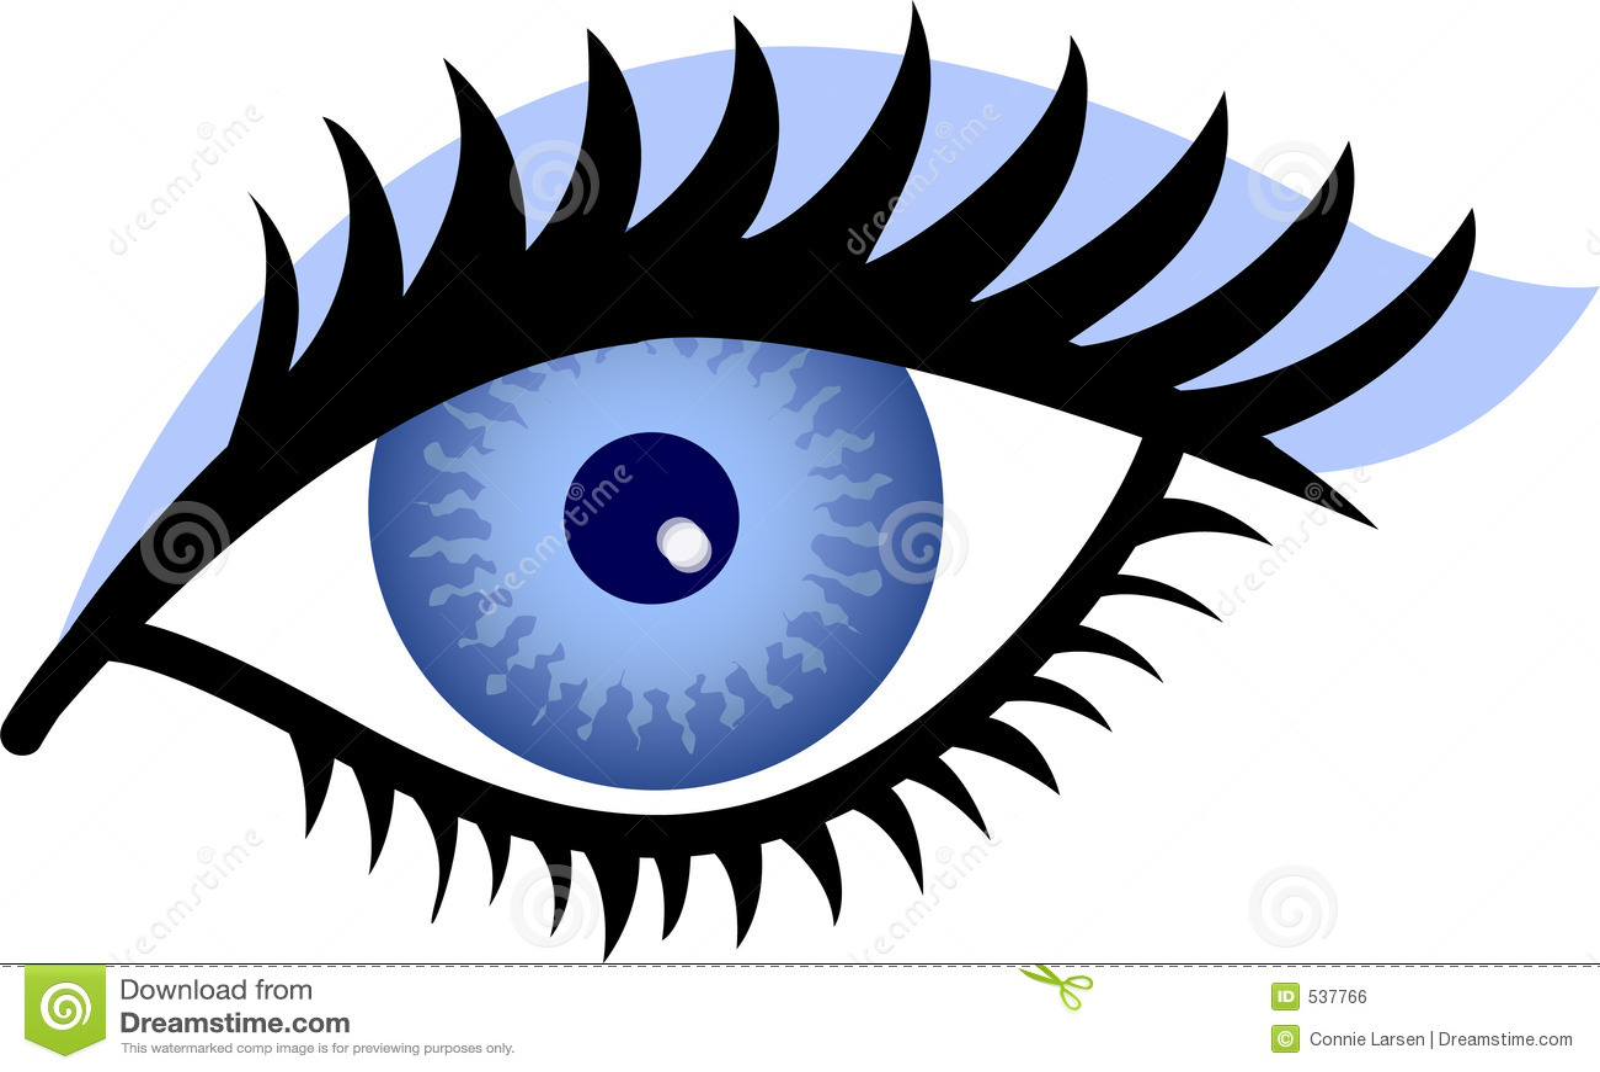 Download 蓝眼睛 库存例证. 插画 包括有 角膜, 眼睛, 方式, 装饰, 符号, beauvoir, 颜色, 光学, 图画 - 537766